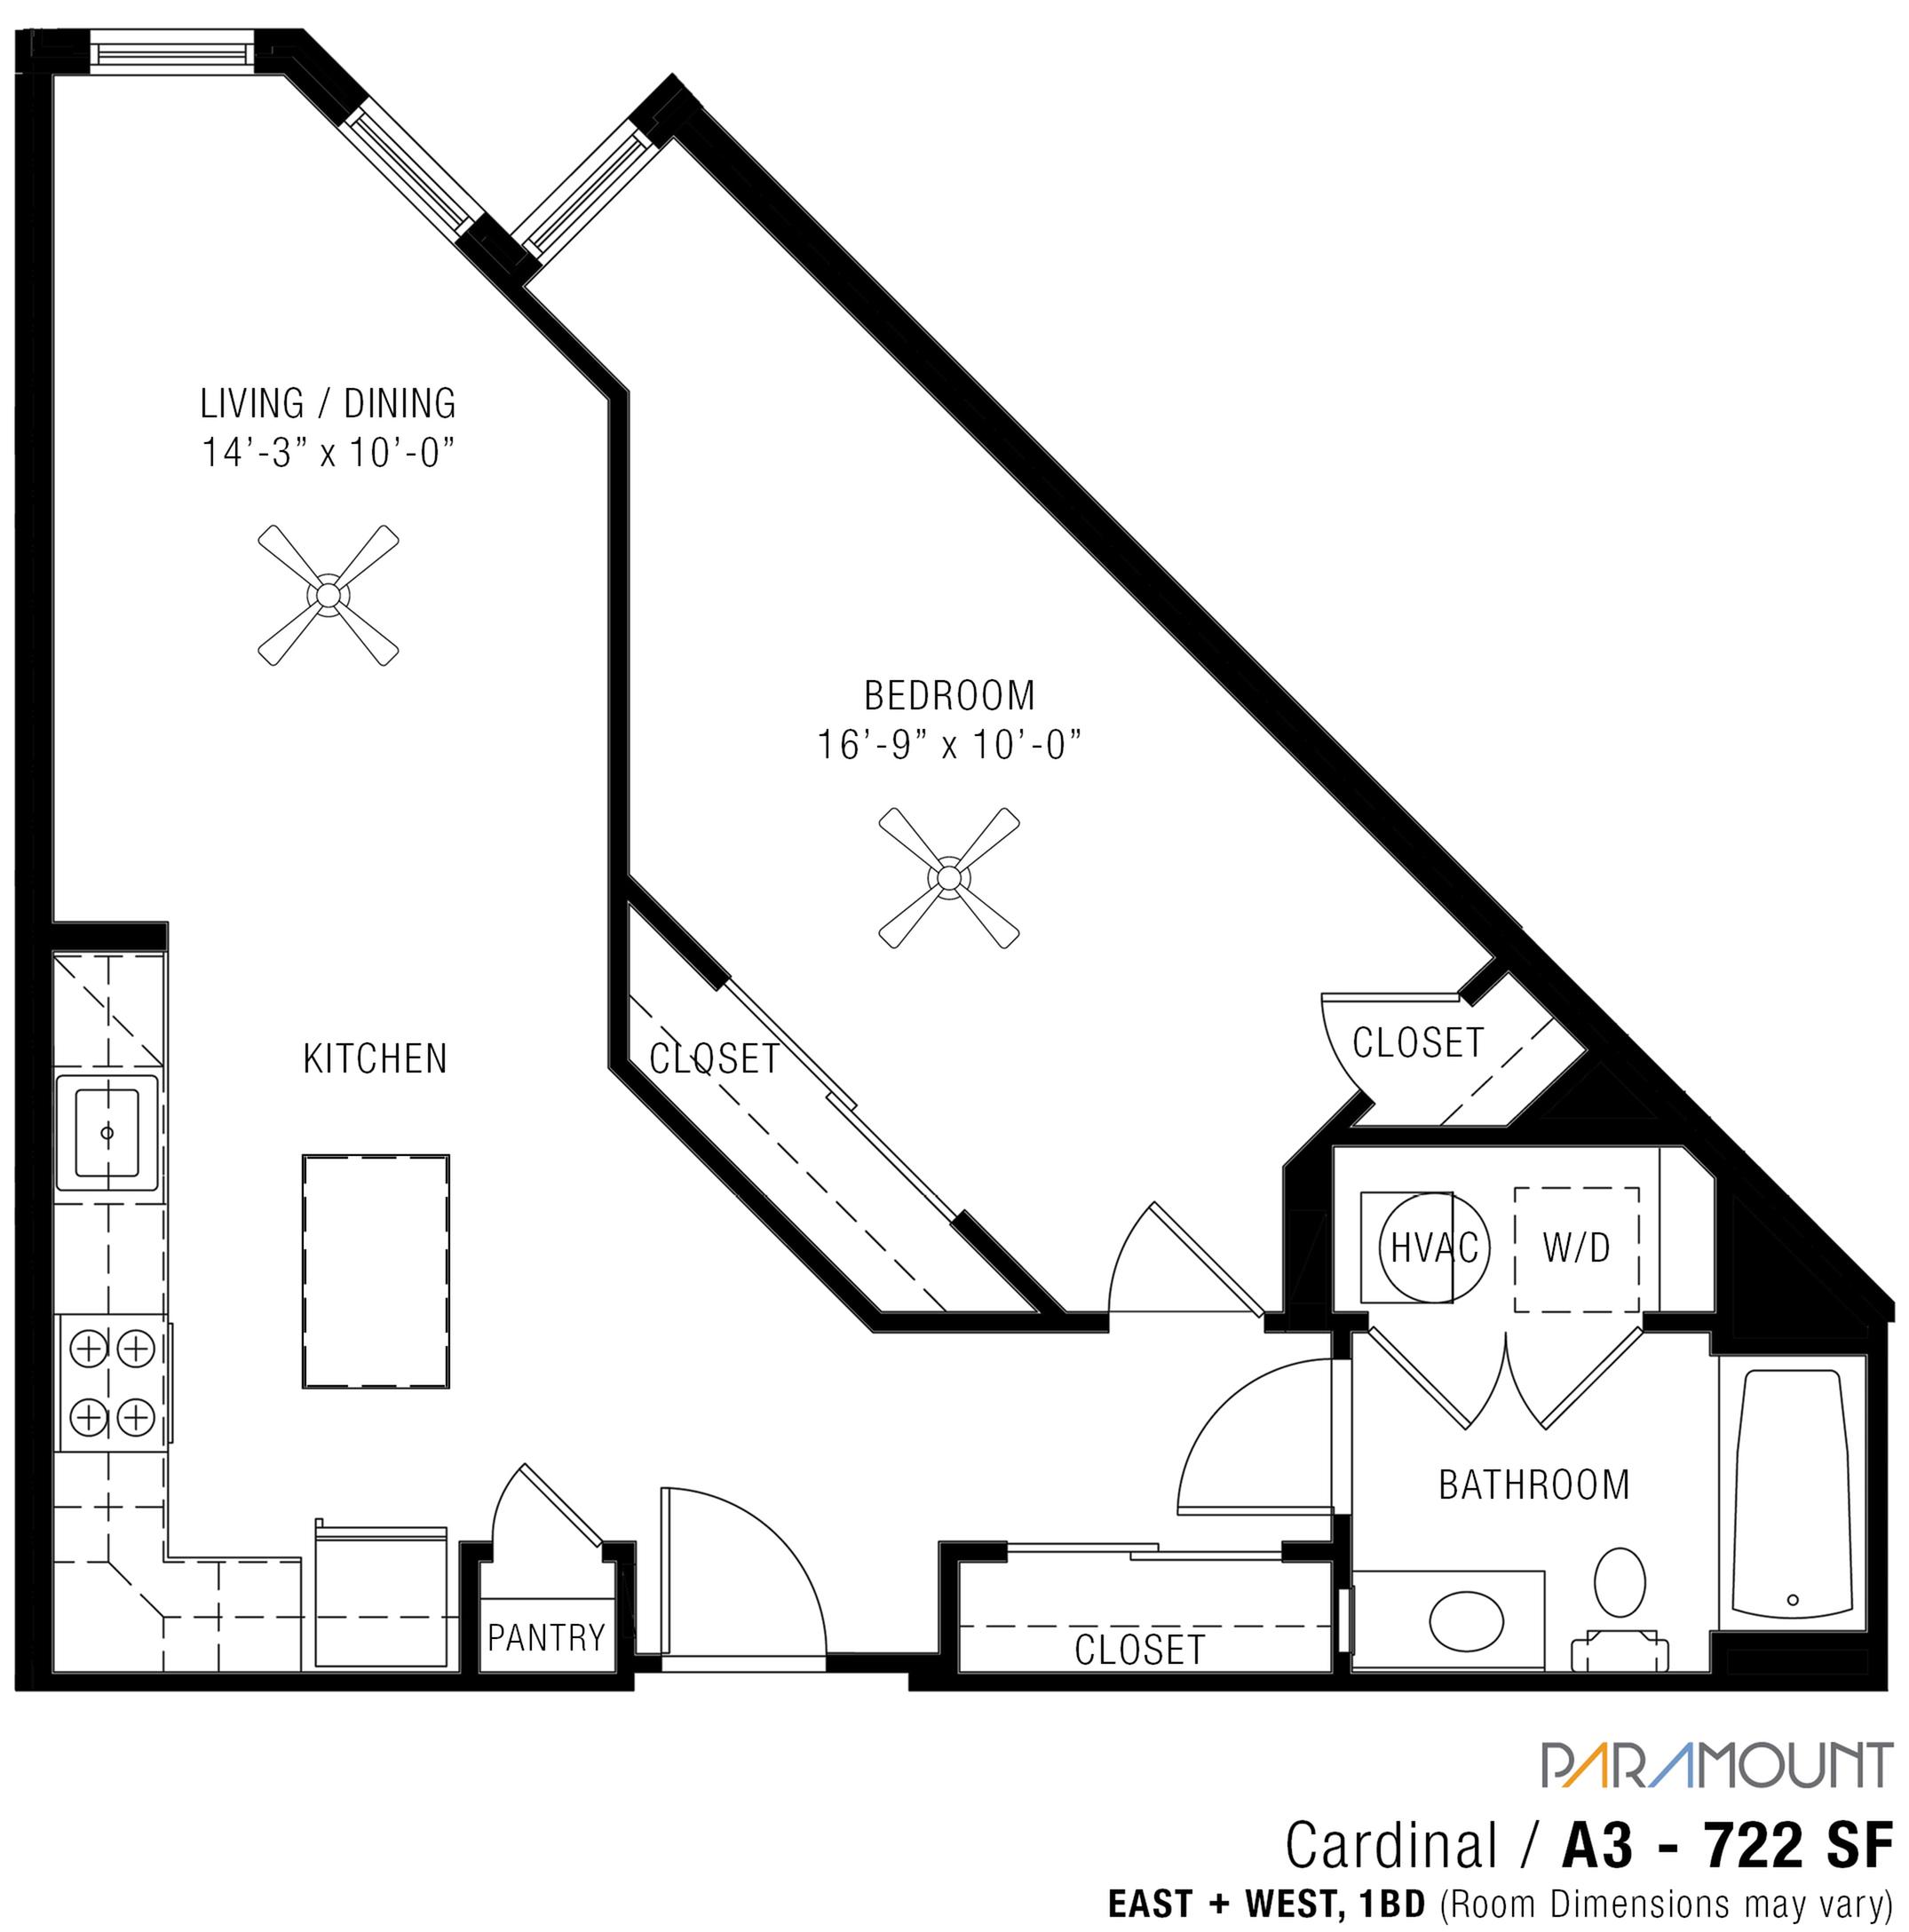 1 Bedroom Apartments   Paramount